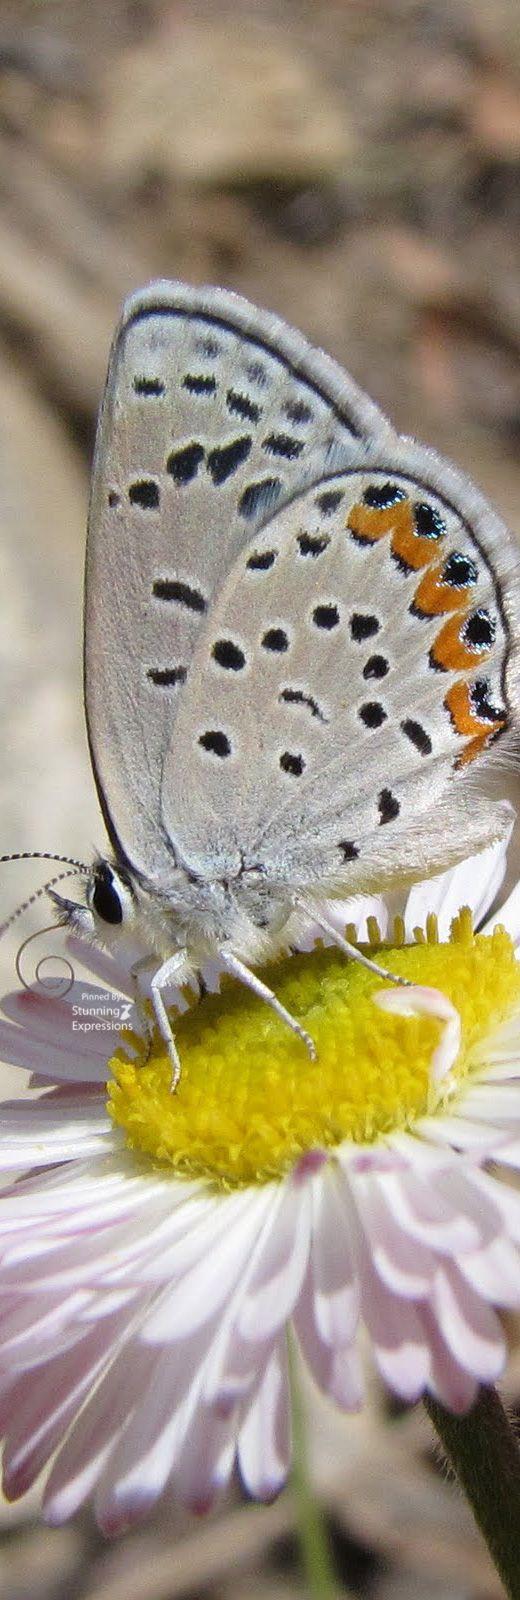 butterflies.quenalbertini: Butterfly on daisie flower | Stunning Expressions